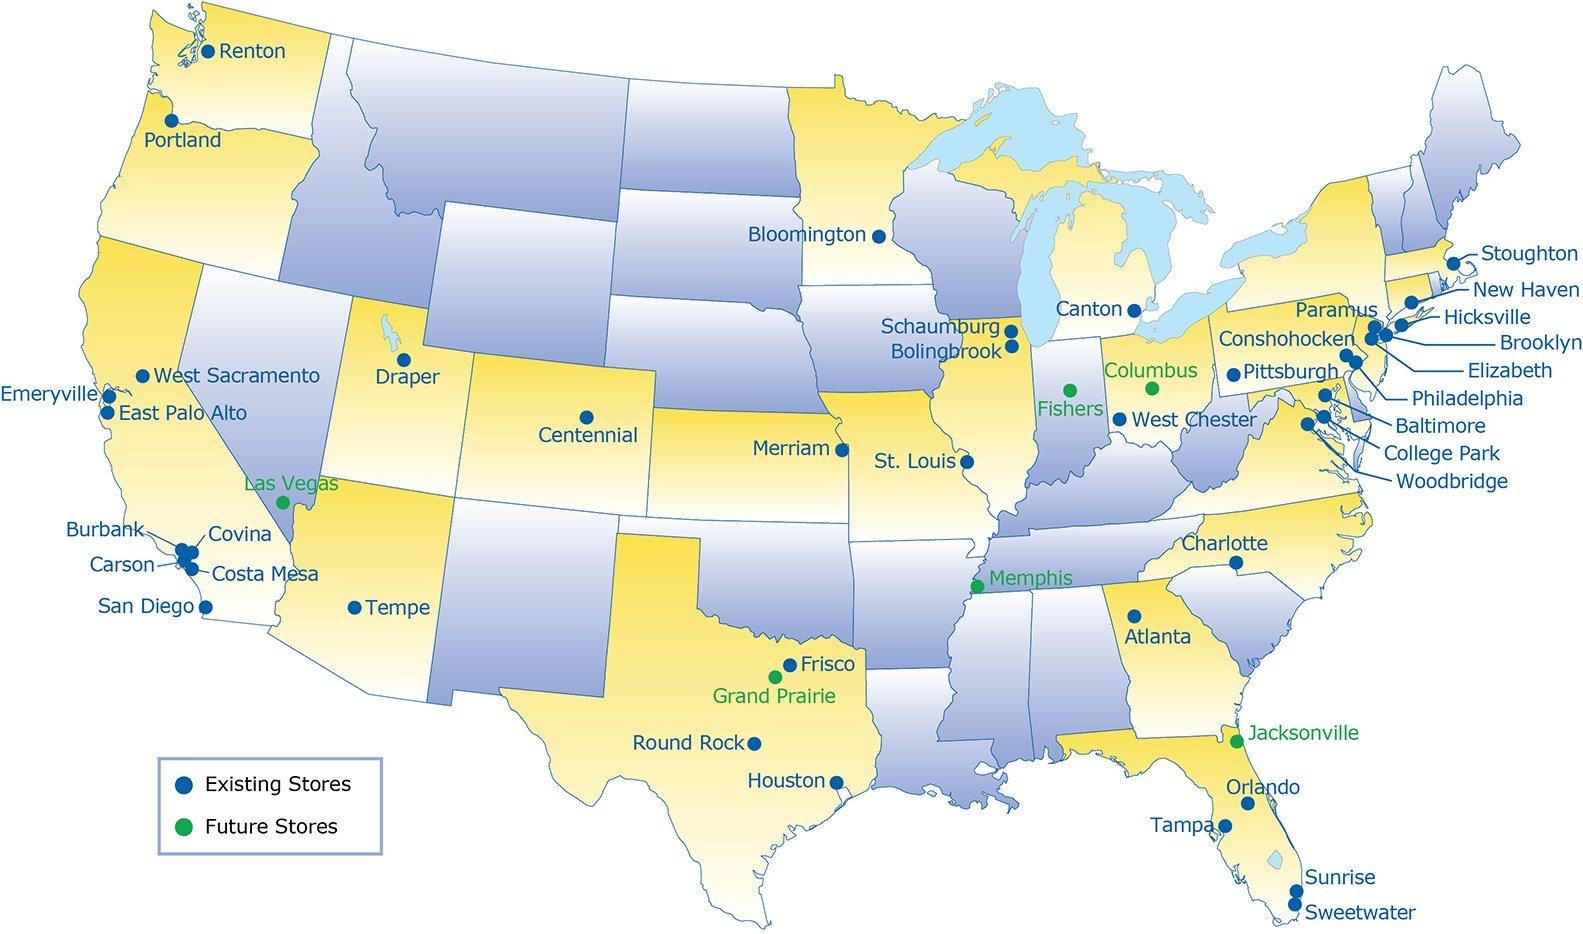 Ikea Locations | Amir Mann Ami Shinar Architects And Planners Ltd Status - Ikea Locations California Map